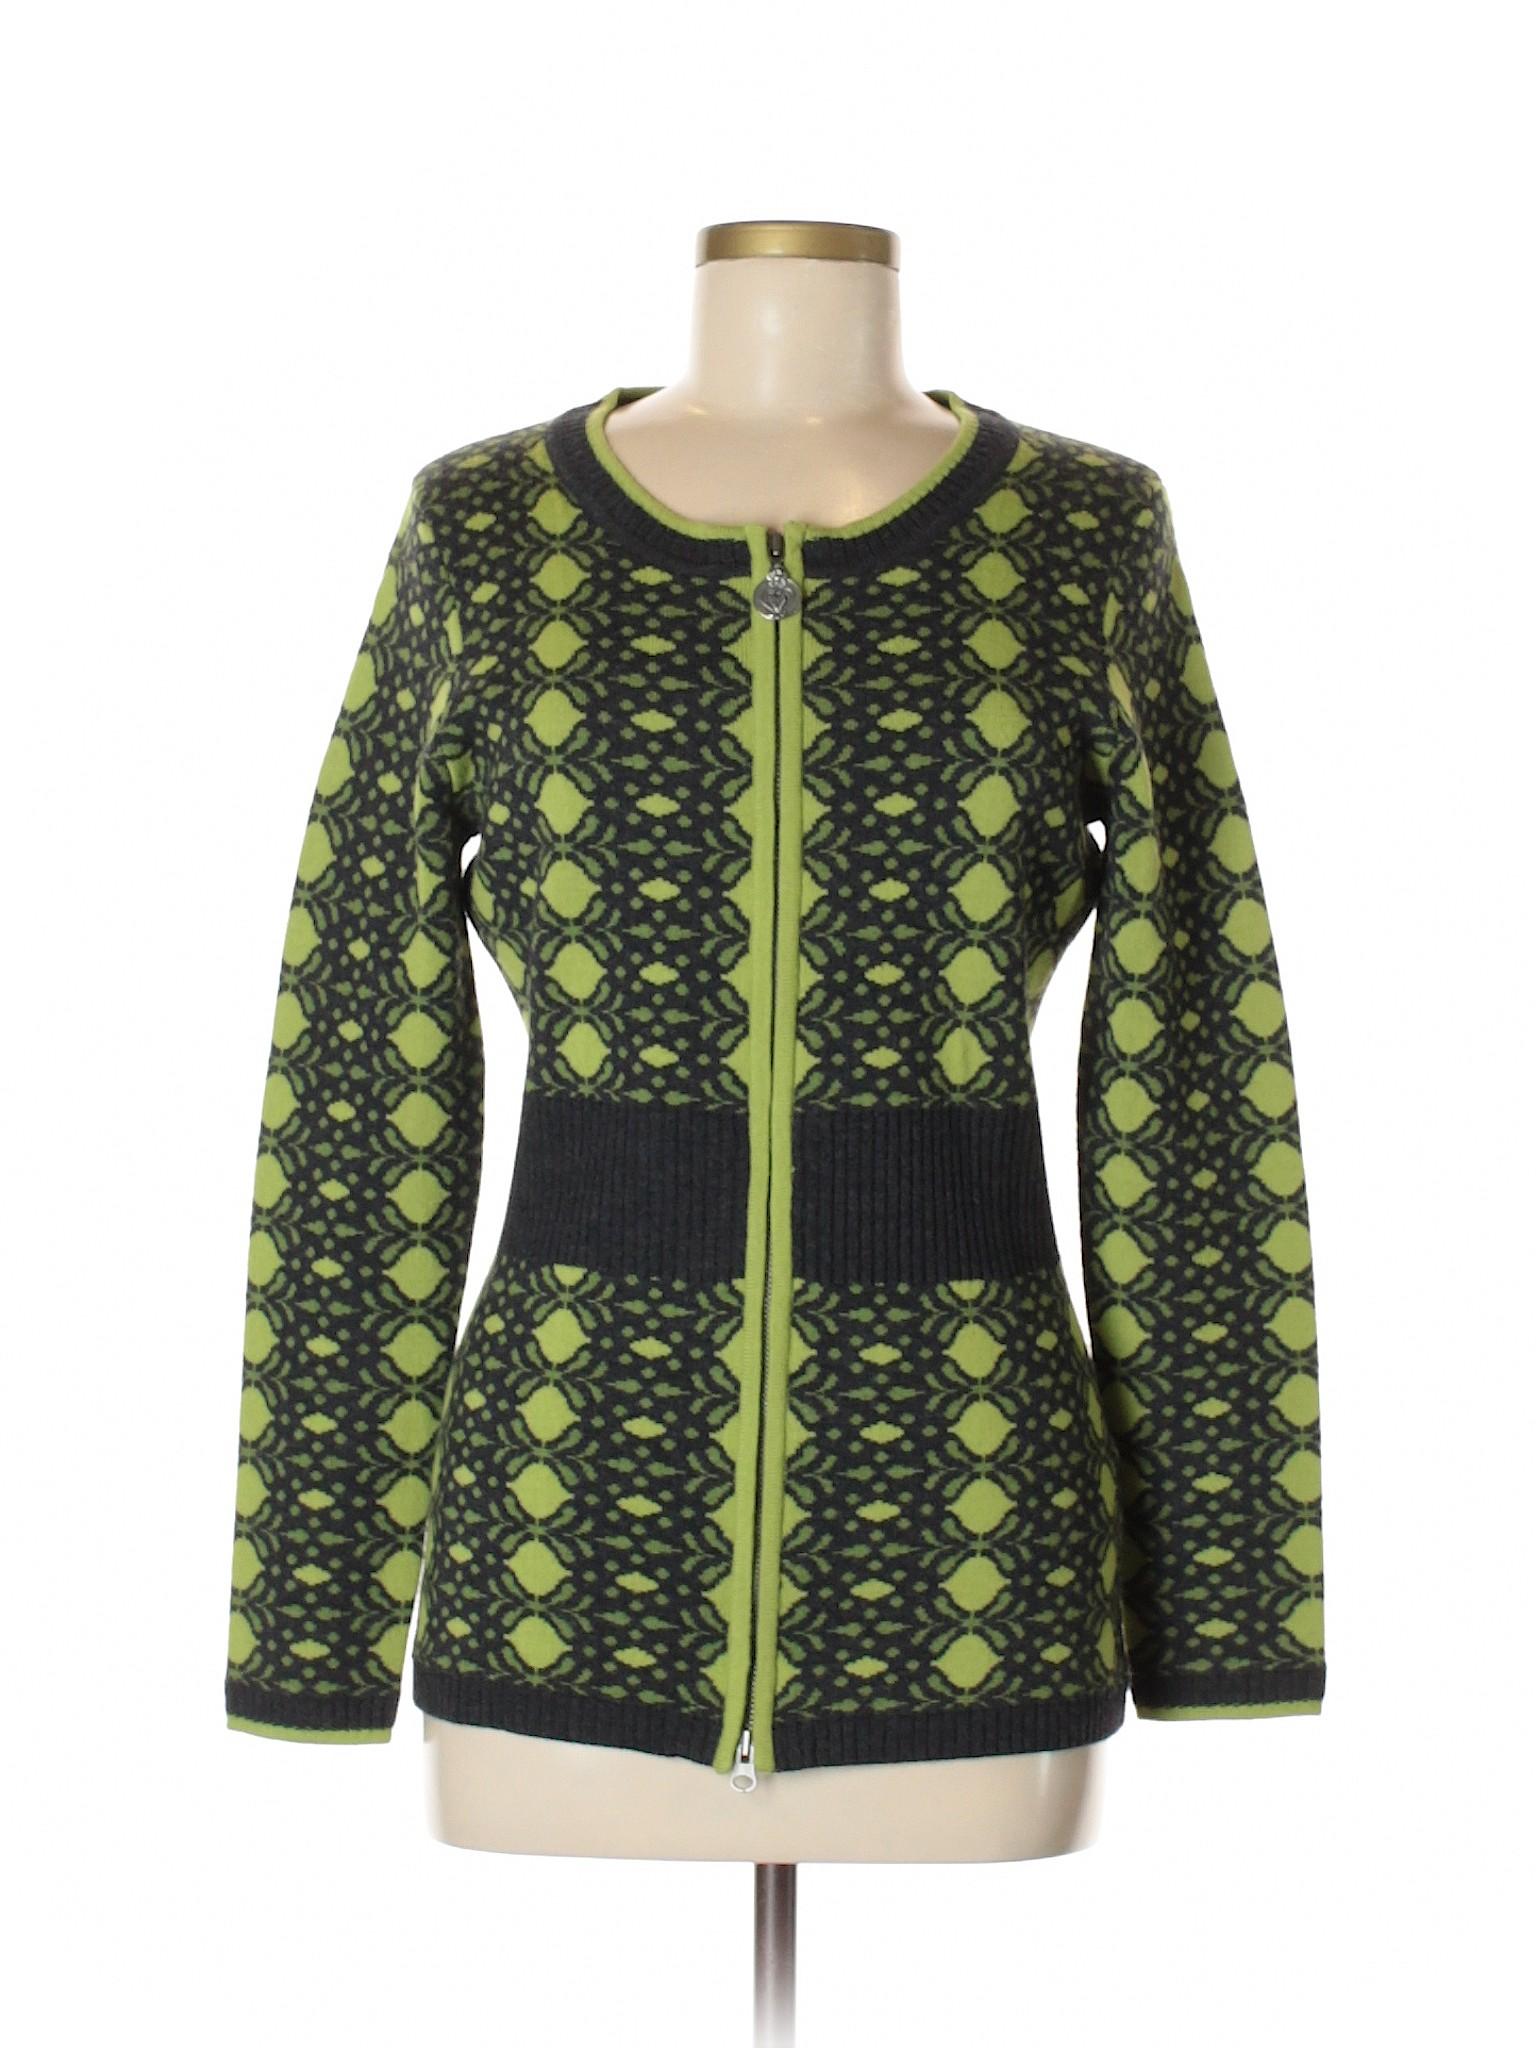 Designs Boutique Cardigan Designs Boutique Cardigan Designs Neve Wool Wool Wool Neve Boutique Neve Cardigan Boutique ArfcUYvcW